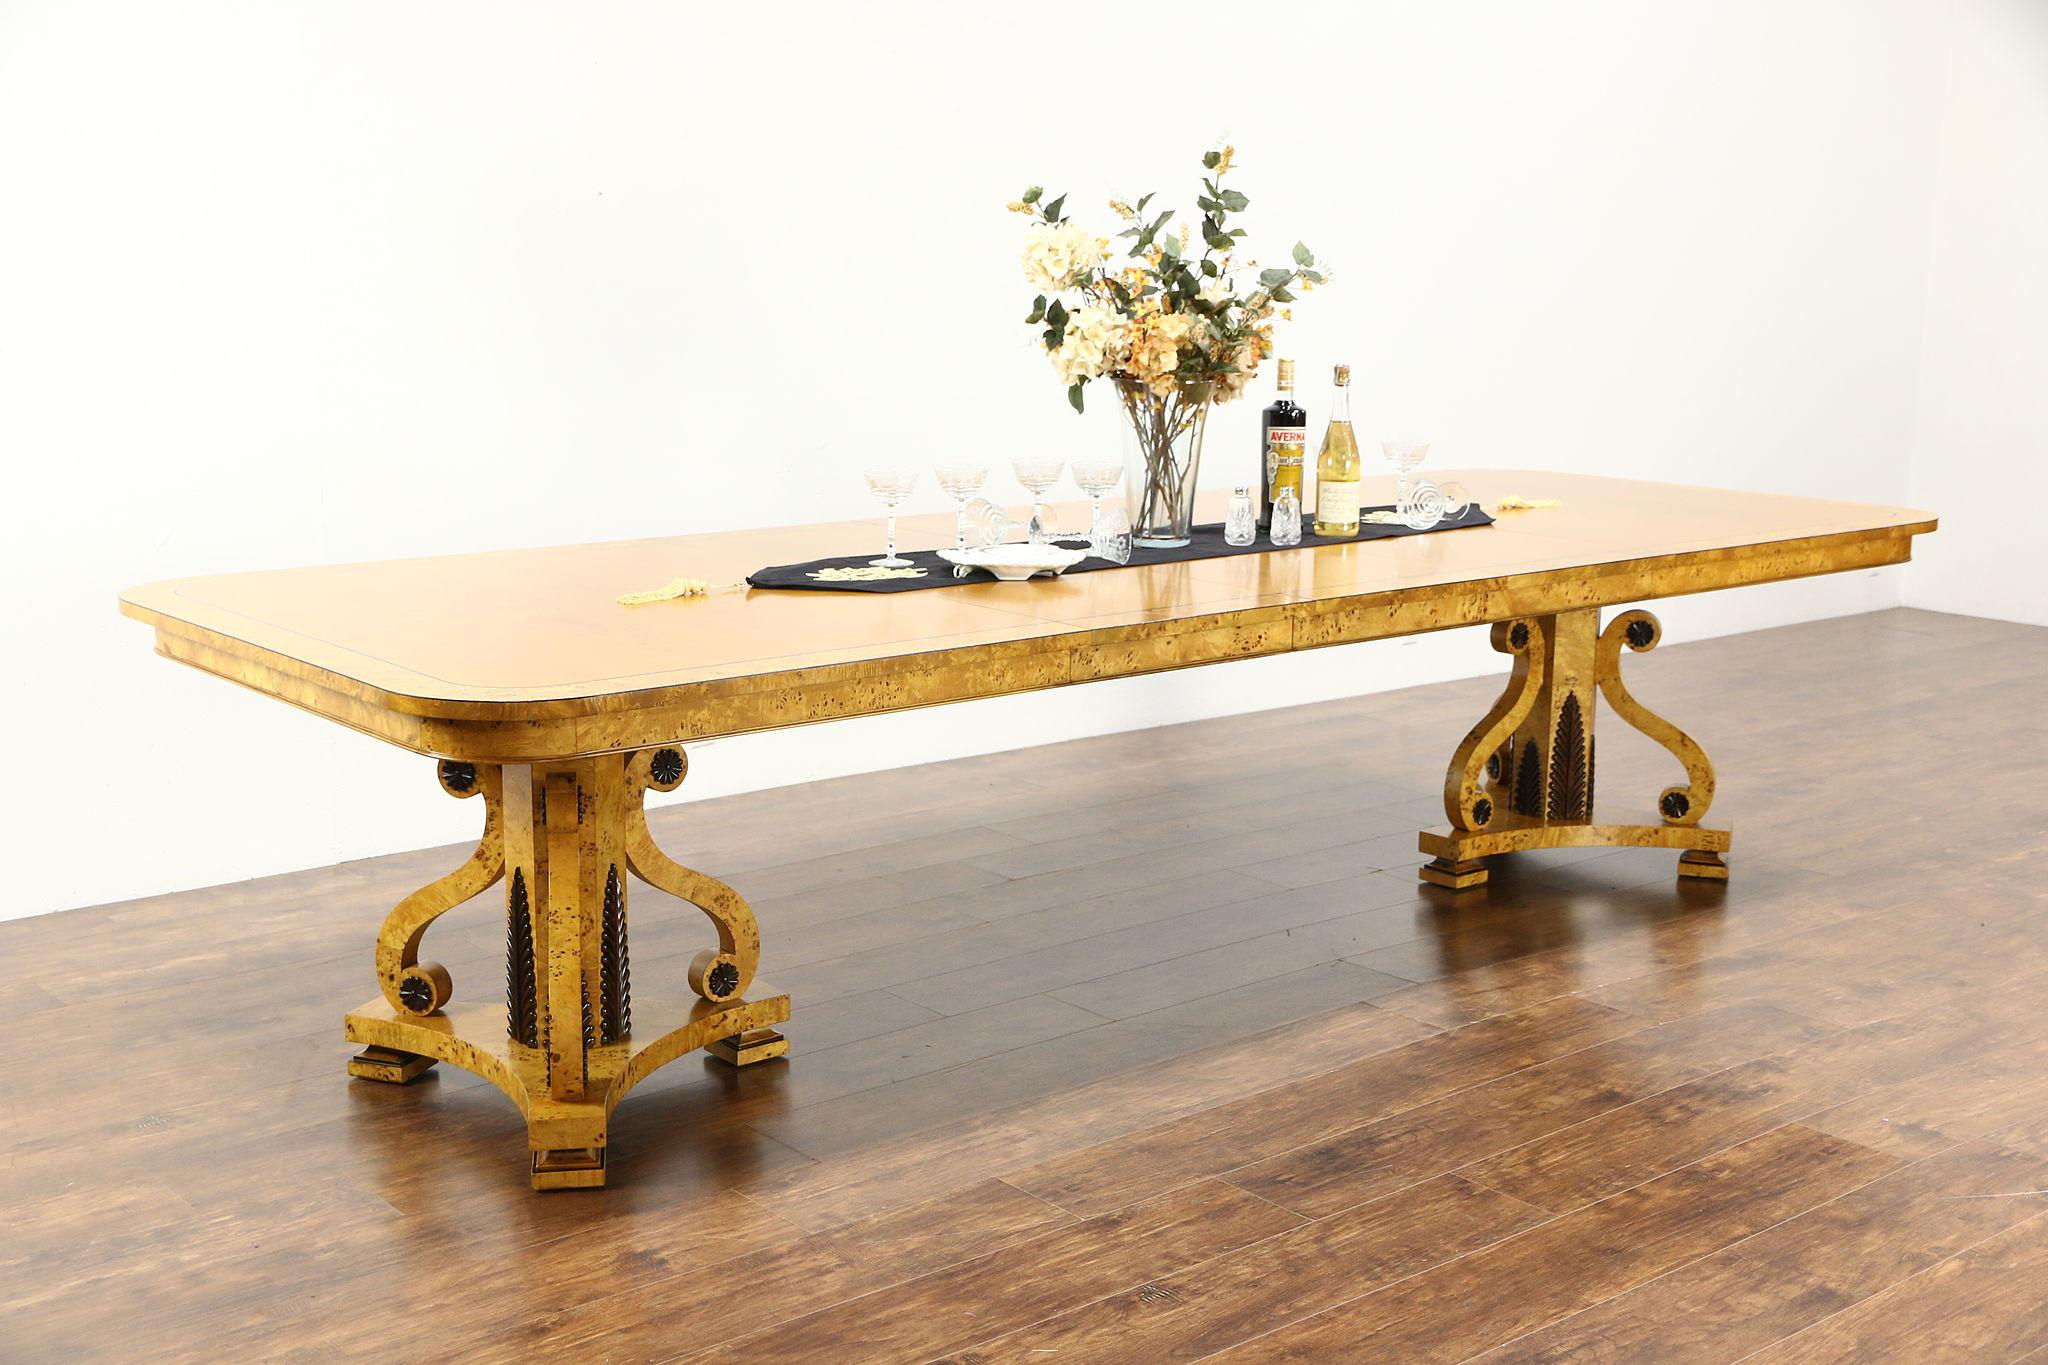 Empire Or Biedermeier Style Burl Dining Table, Signed Baker, Extends 11u0027